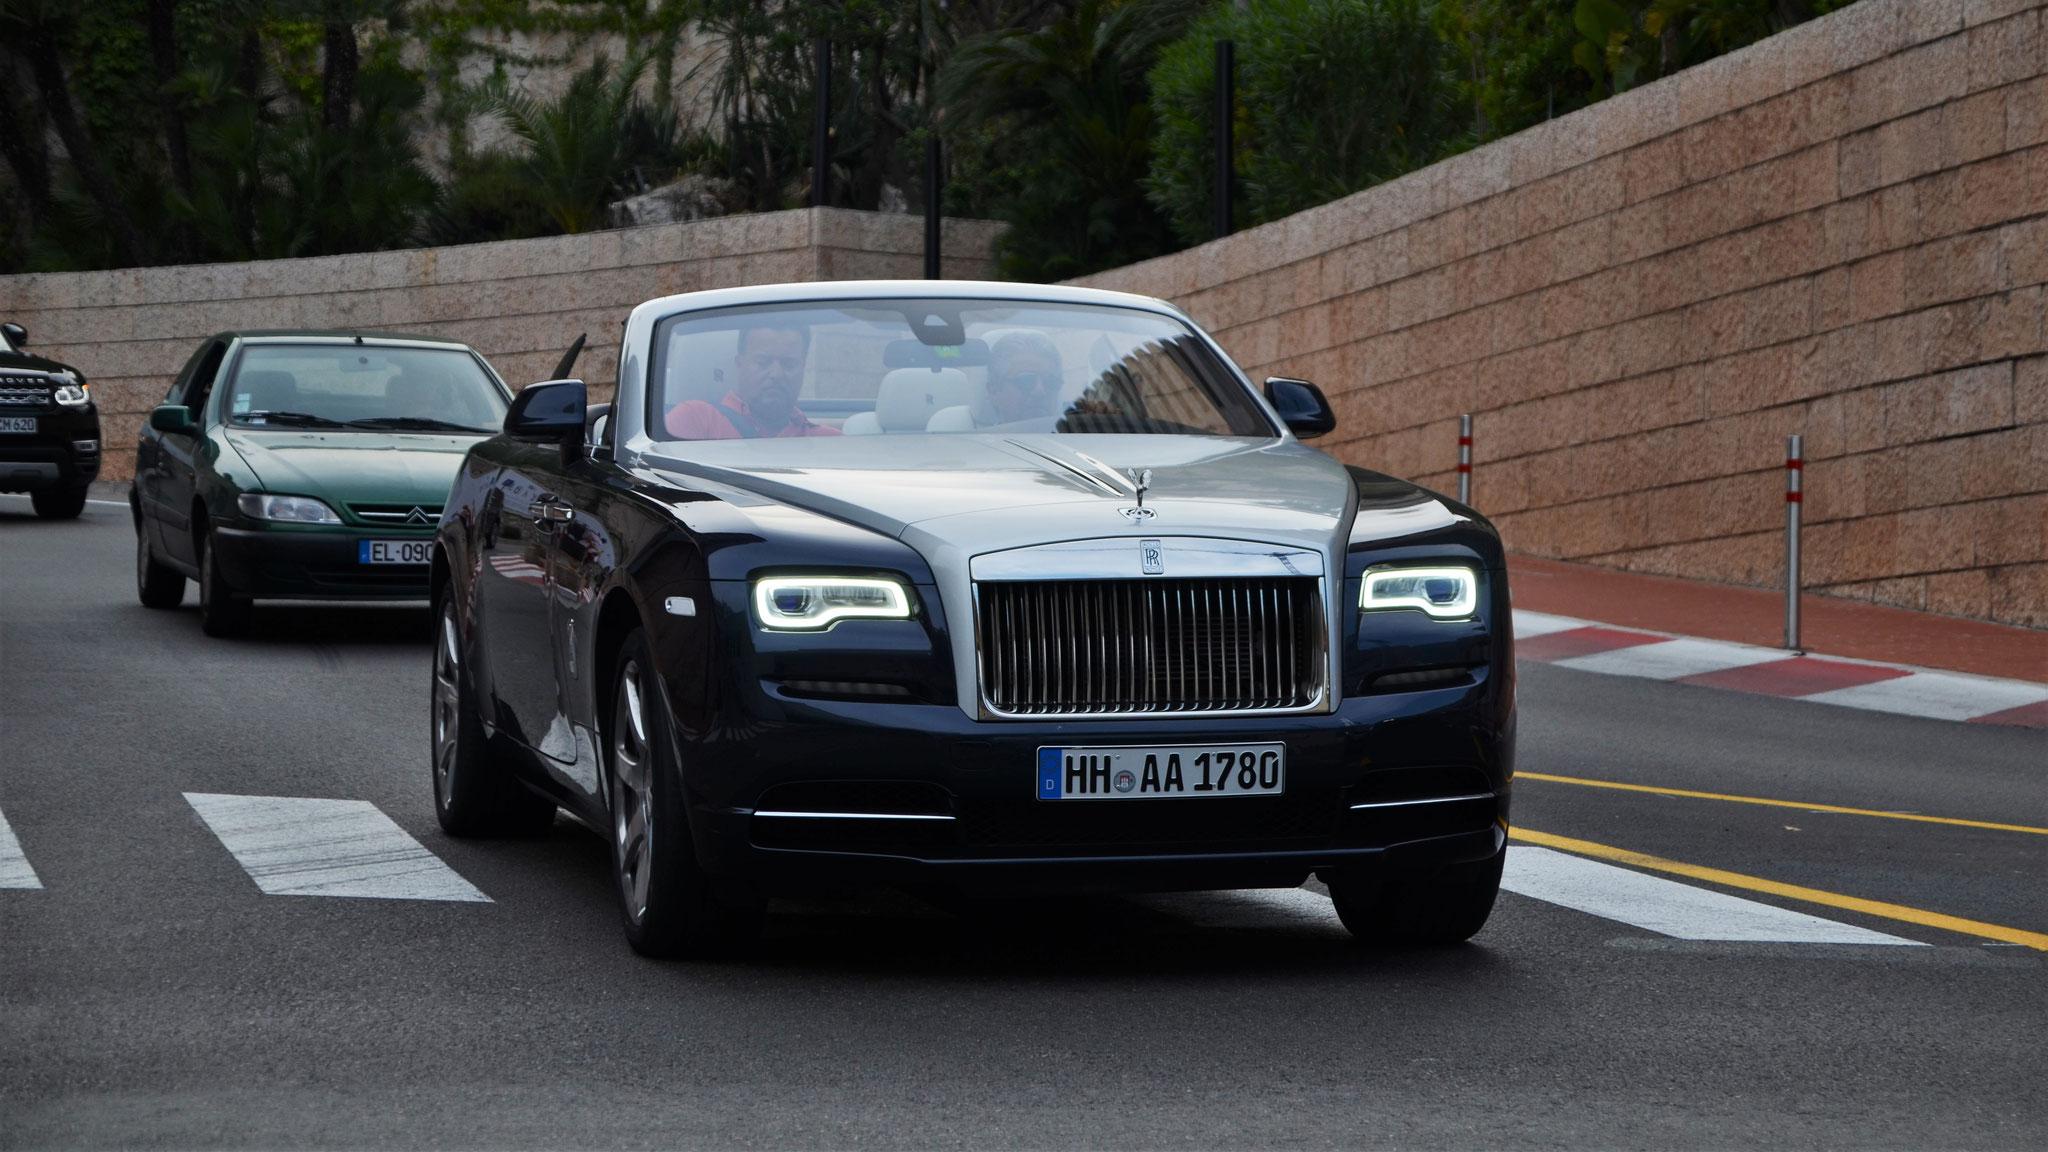 Rolls Royce Dawn - HH-AA-1780